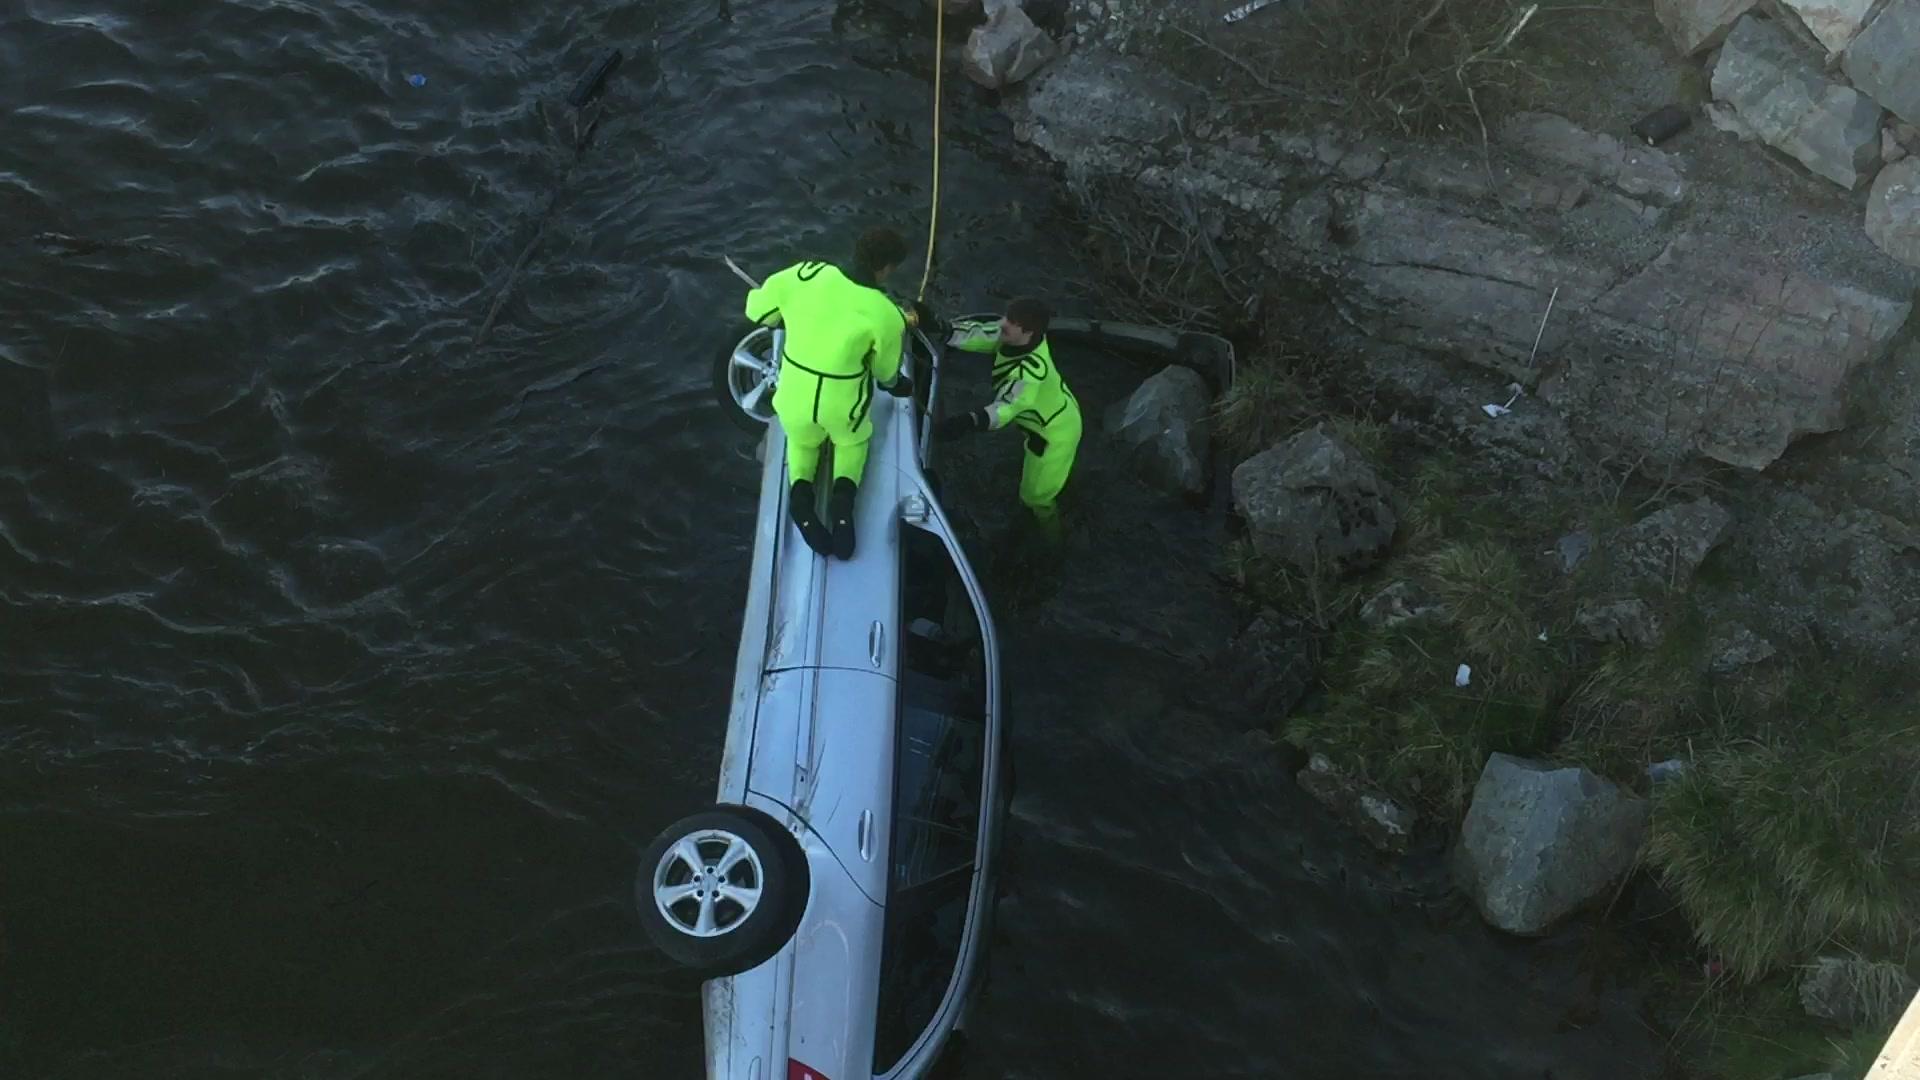 Bil i elva i Børselv